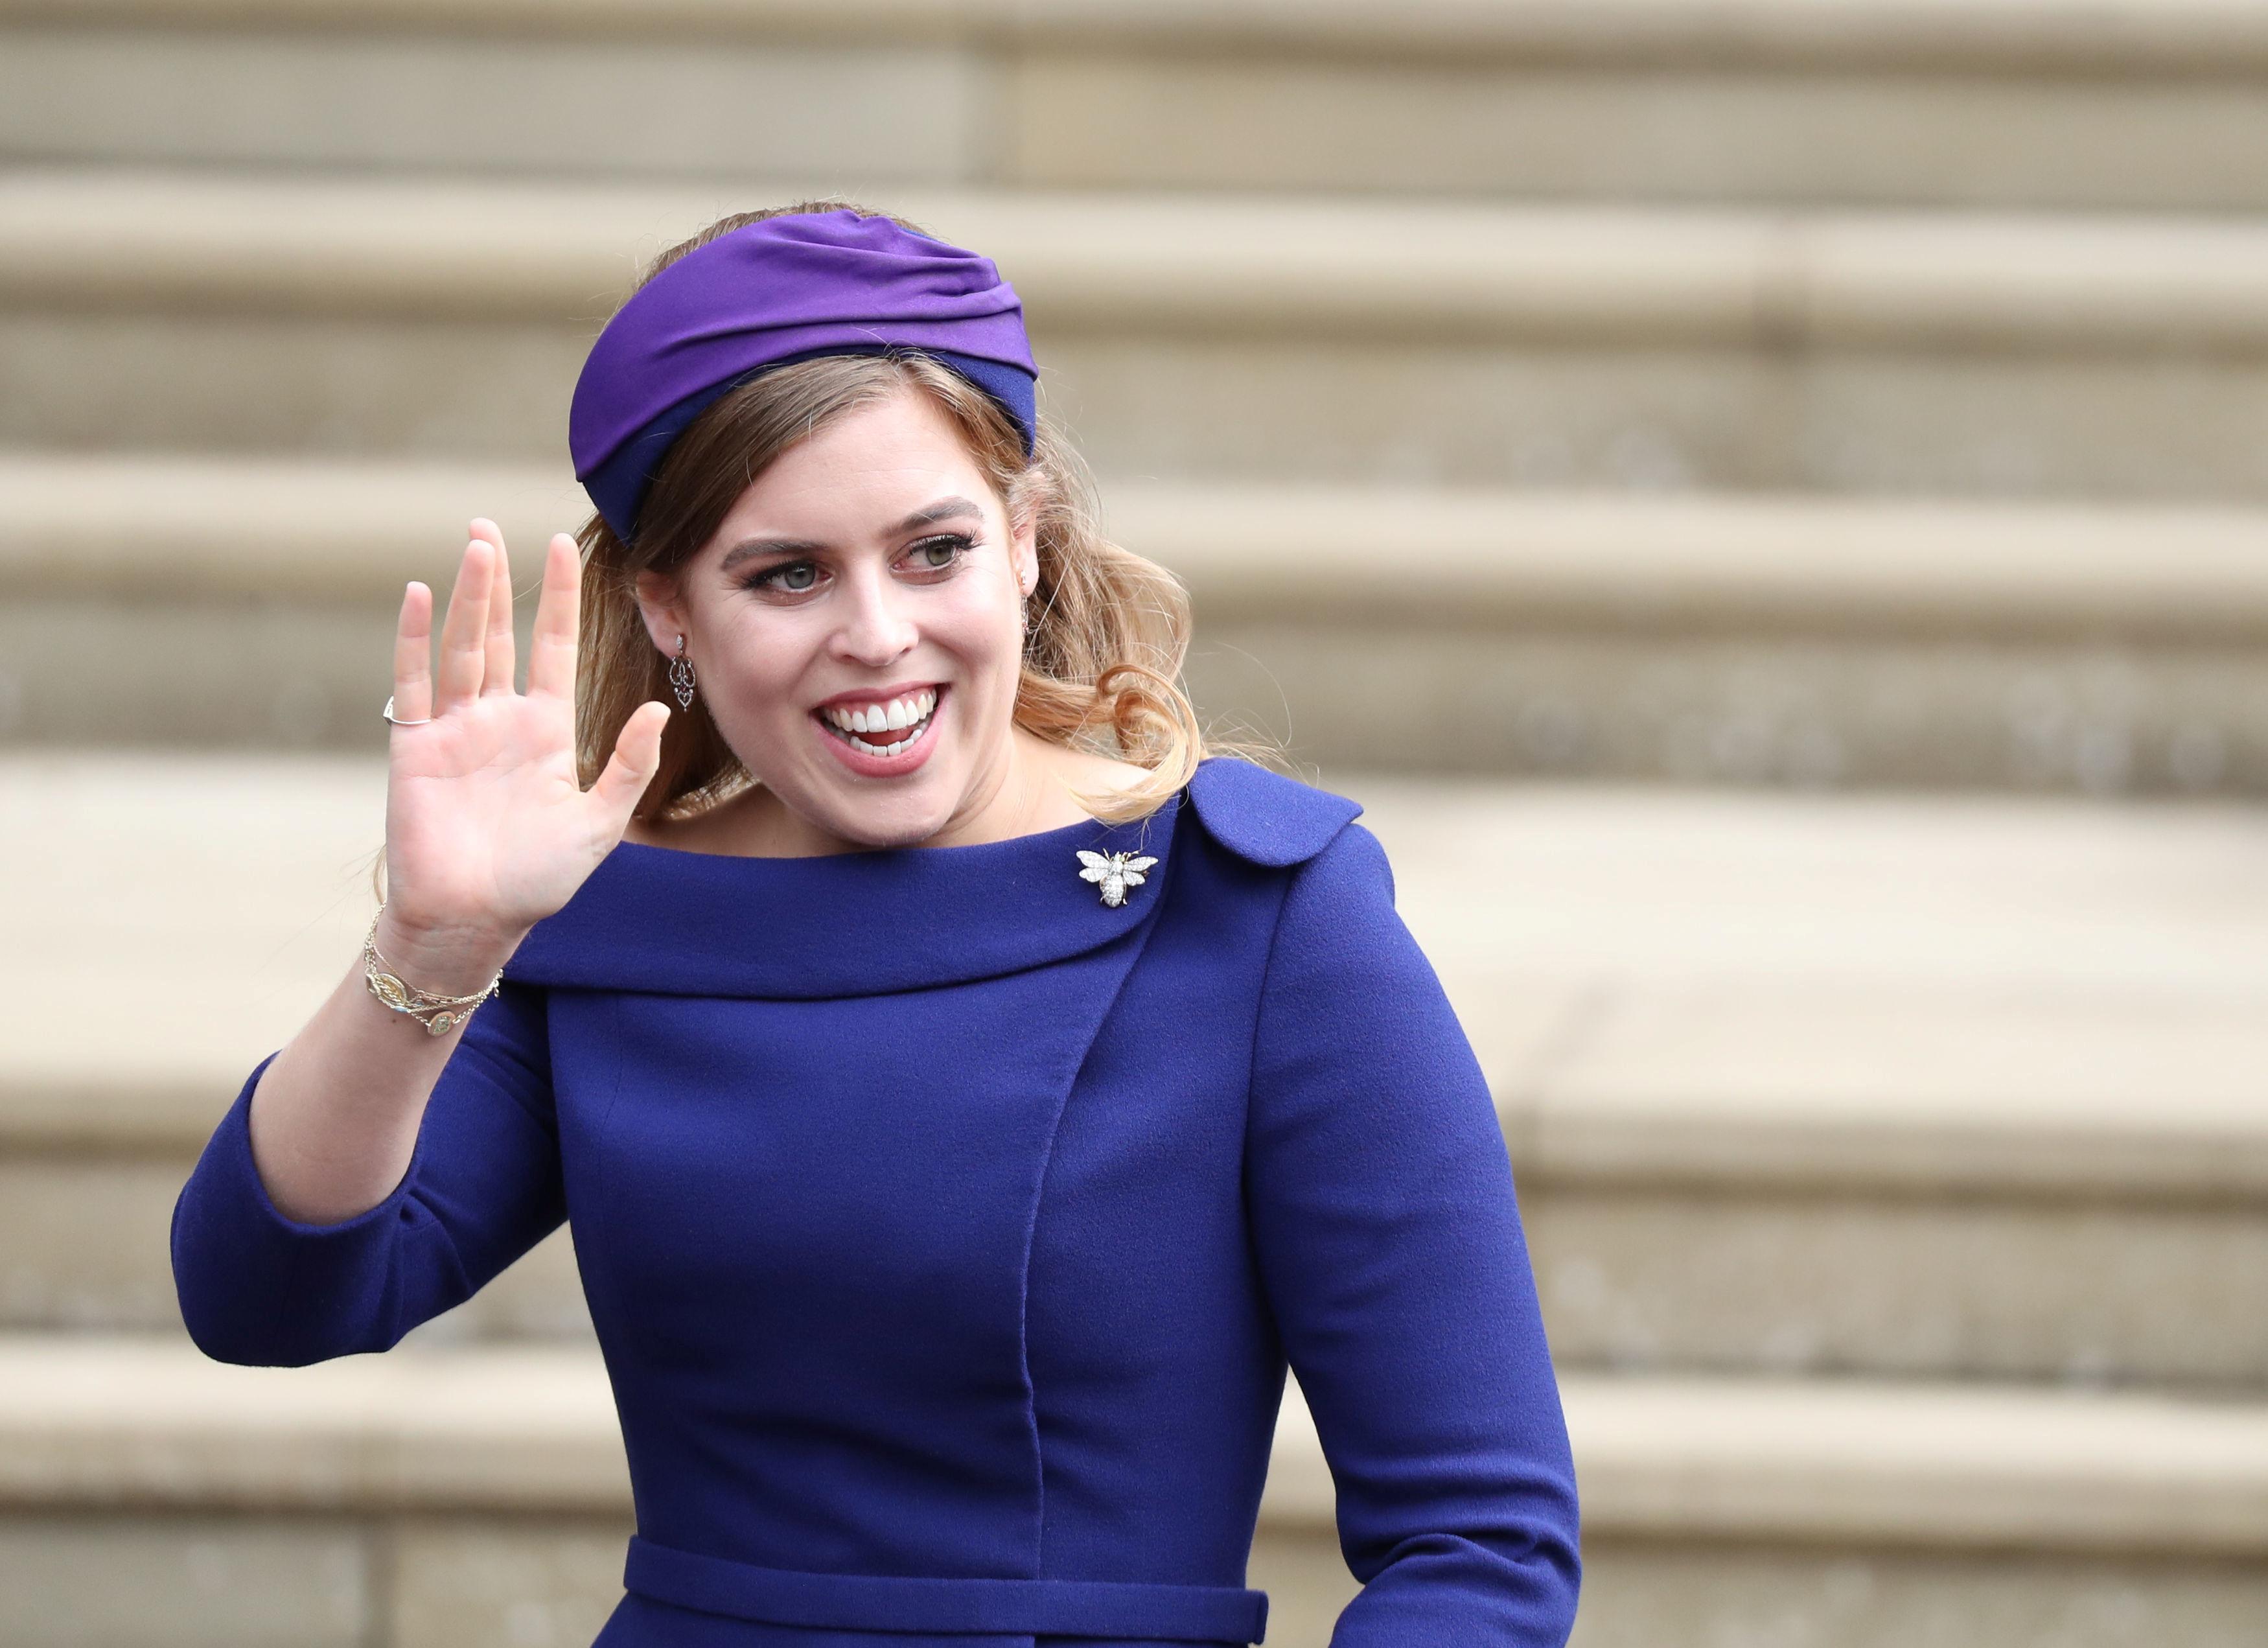 Princess Beatrice arrives for the wedding of Princess Eugenie to Jack Brooksbank at St George's Chapel in Windsor Castle, Windsor, Britain, October 12, 2018. Steve Parsons/Pool via REUTERS